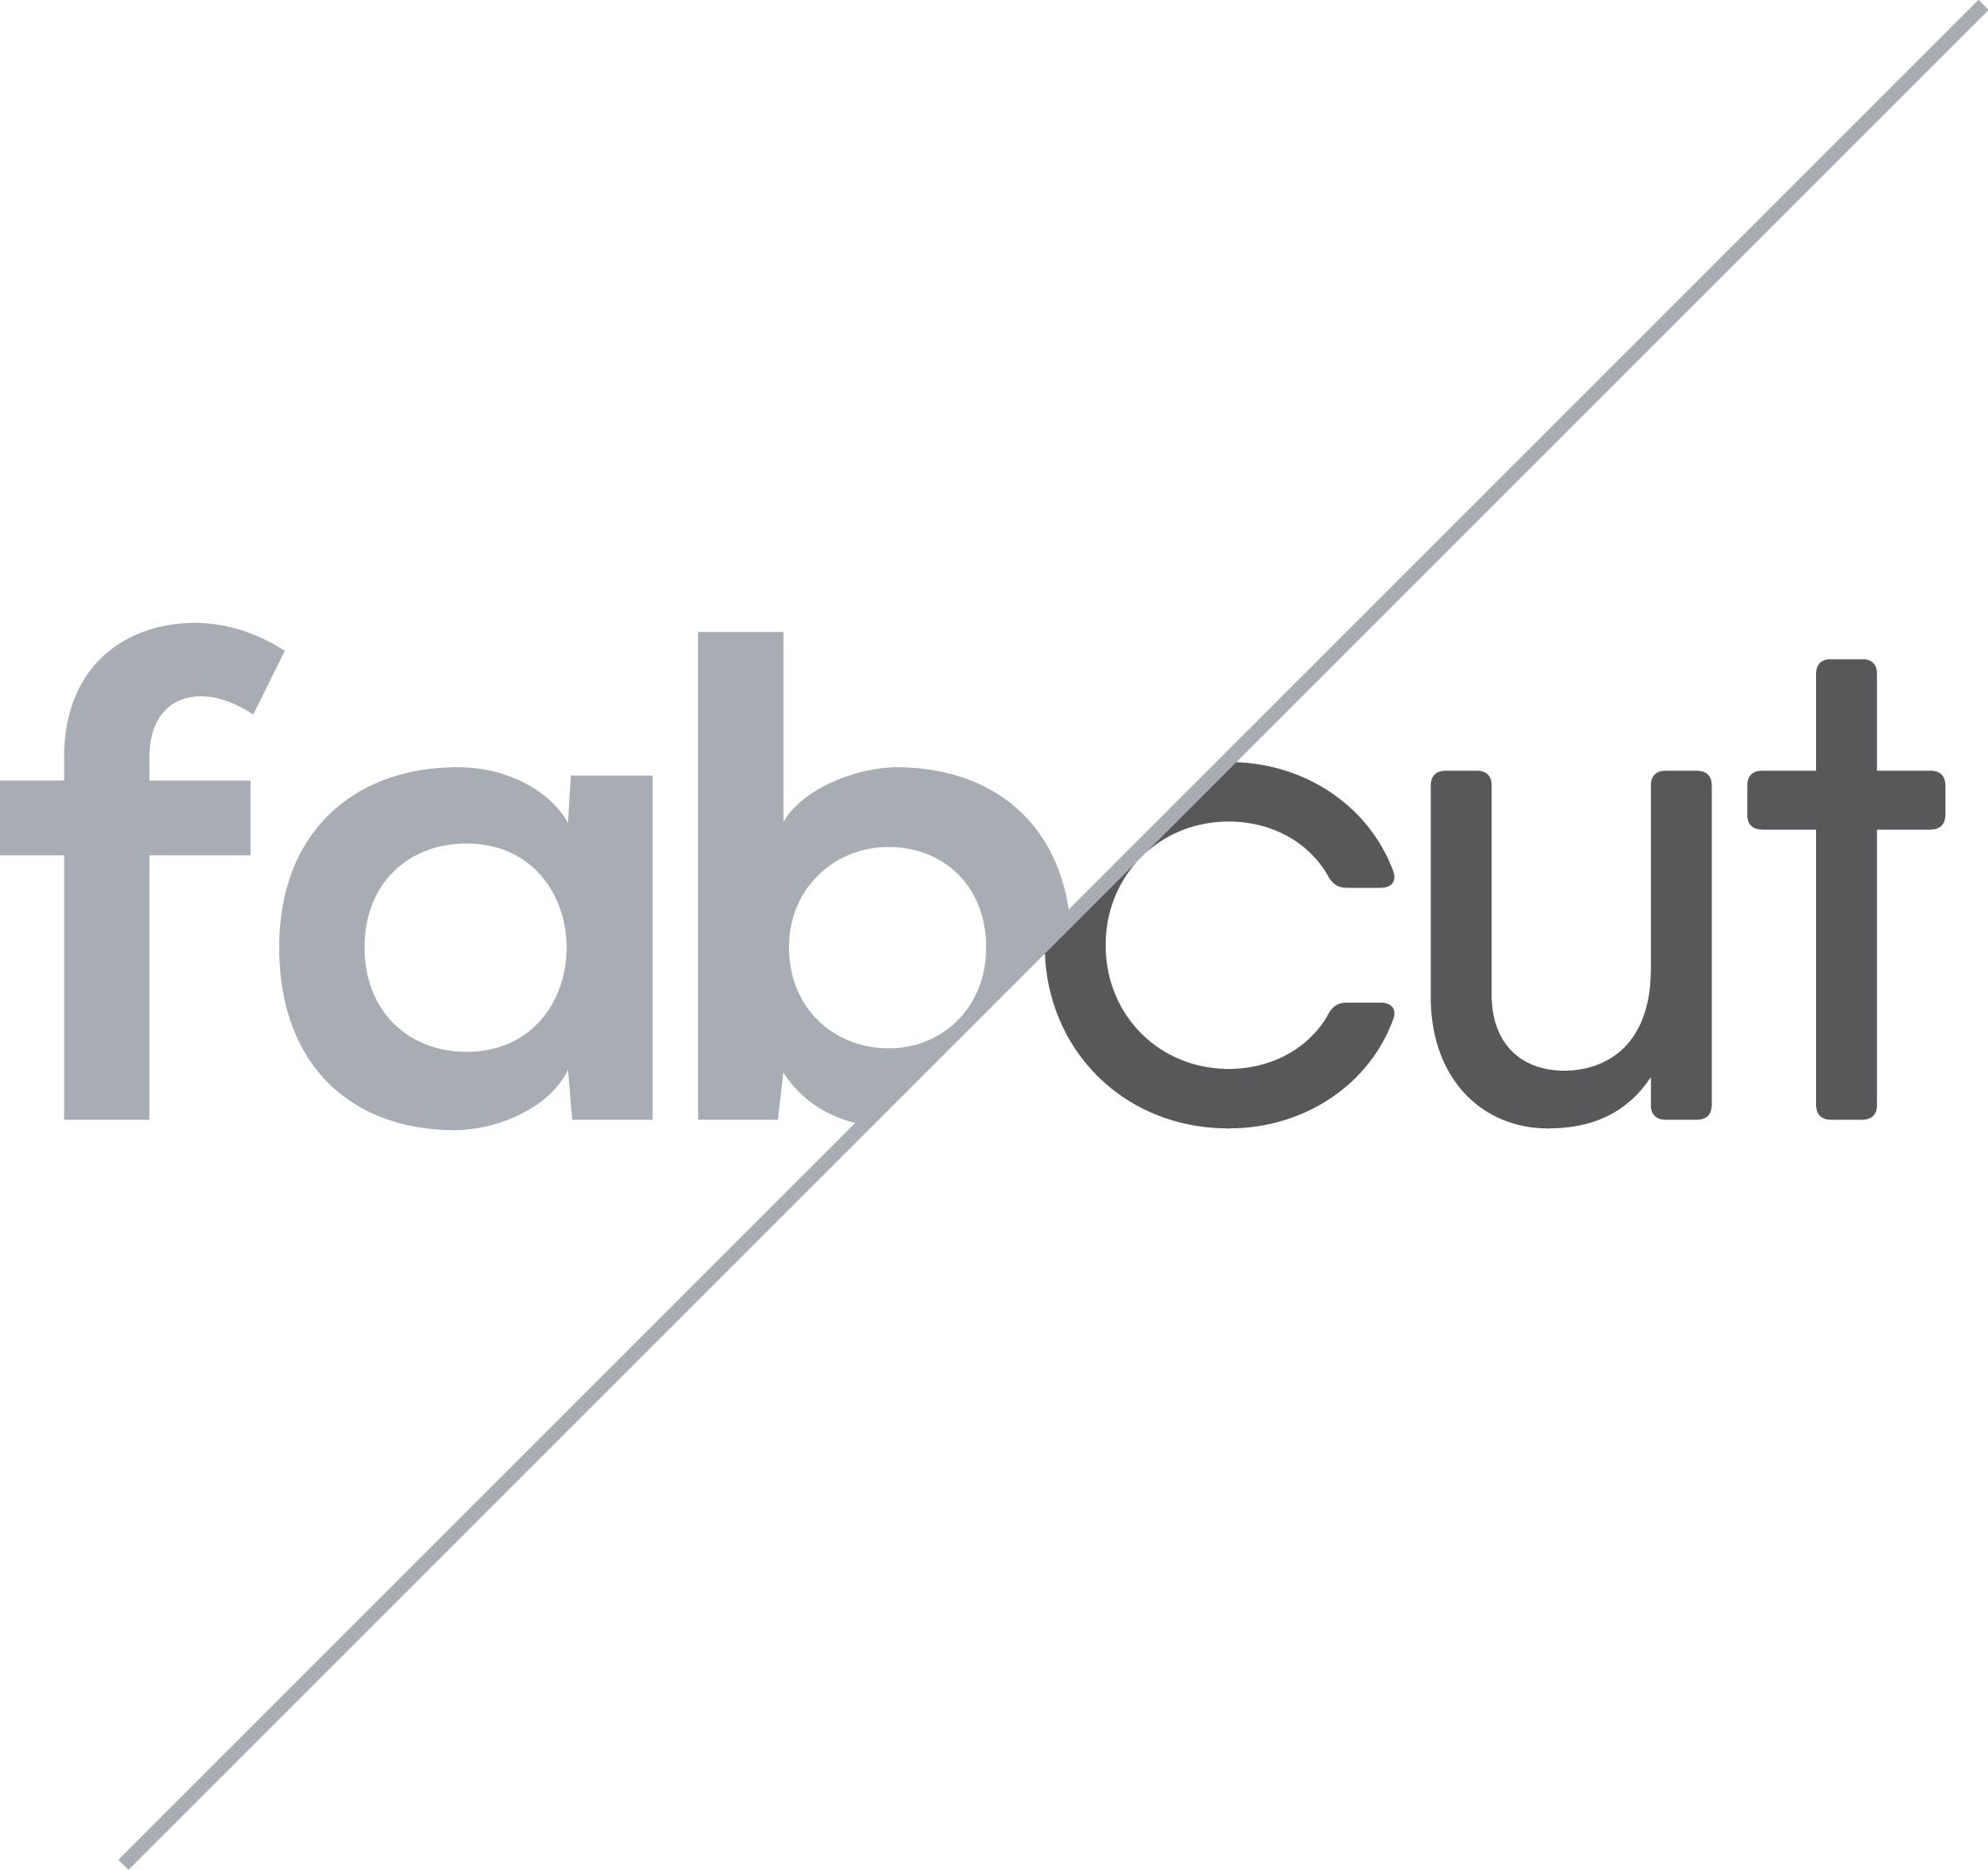 FabCut - Shaping the future of clothing - Company Logo